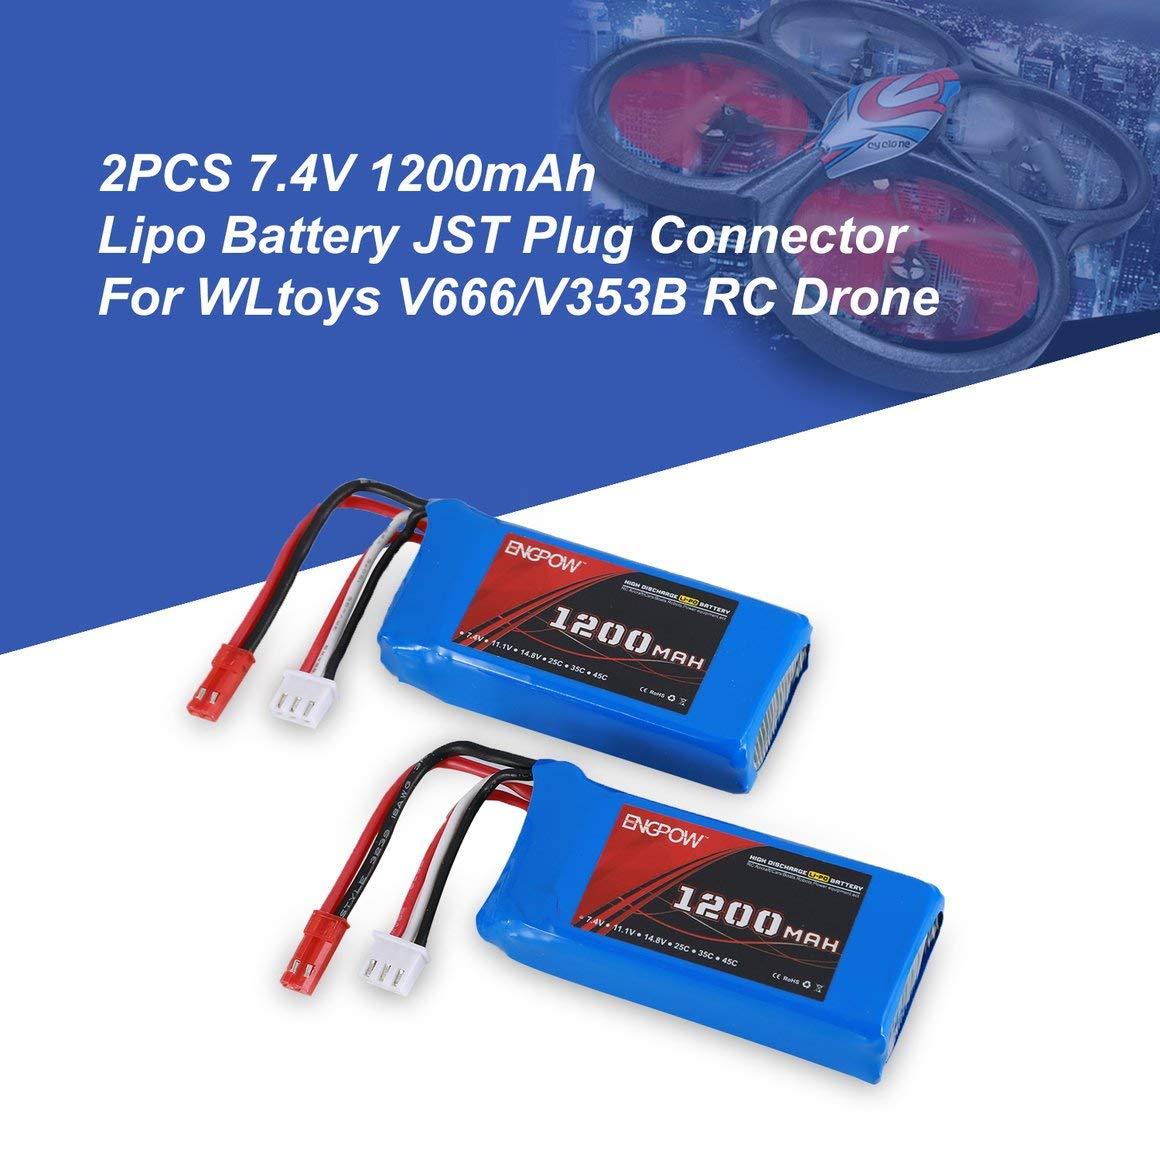 Funnyrunstore 2PCS Engpow 7.4V 1200mAh 2S Batería Lipo Recargable ...